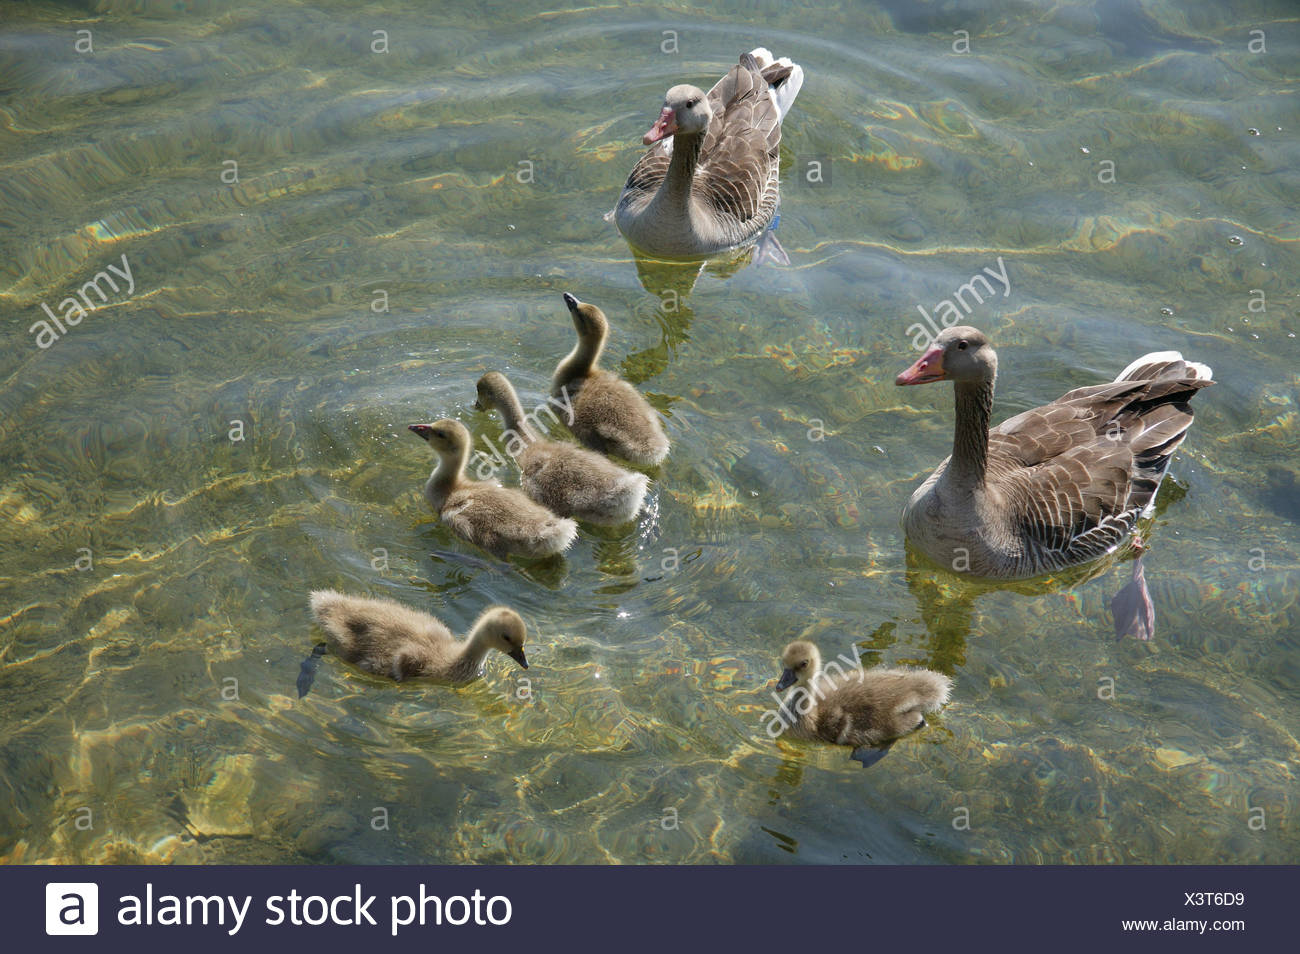 Tiere, Enten, Ente, Jungtiere, Voegel, Vogel, Wildtiere, Wildtier, Gaensevoegel, Entenvoegel, Wasservoegel, Kuecken, Muttertier, - Stock Image